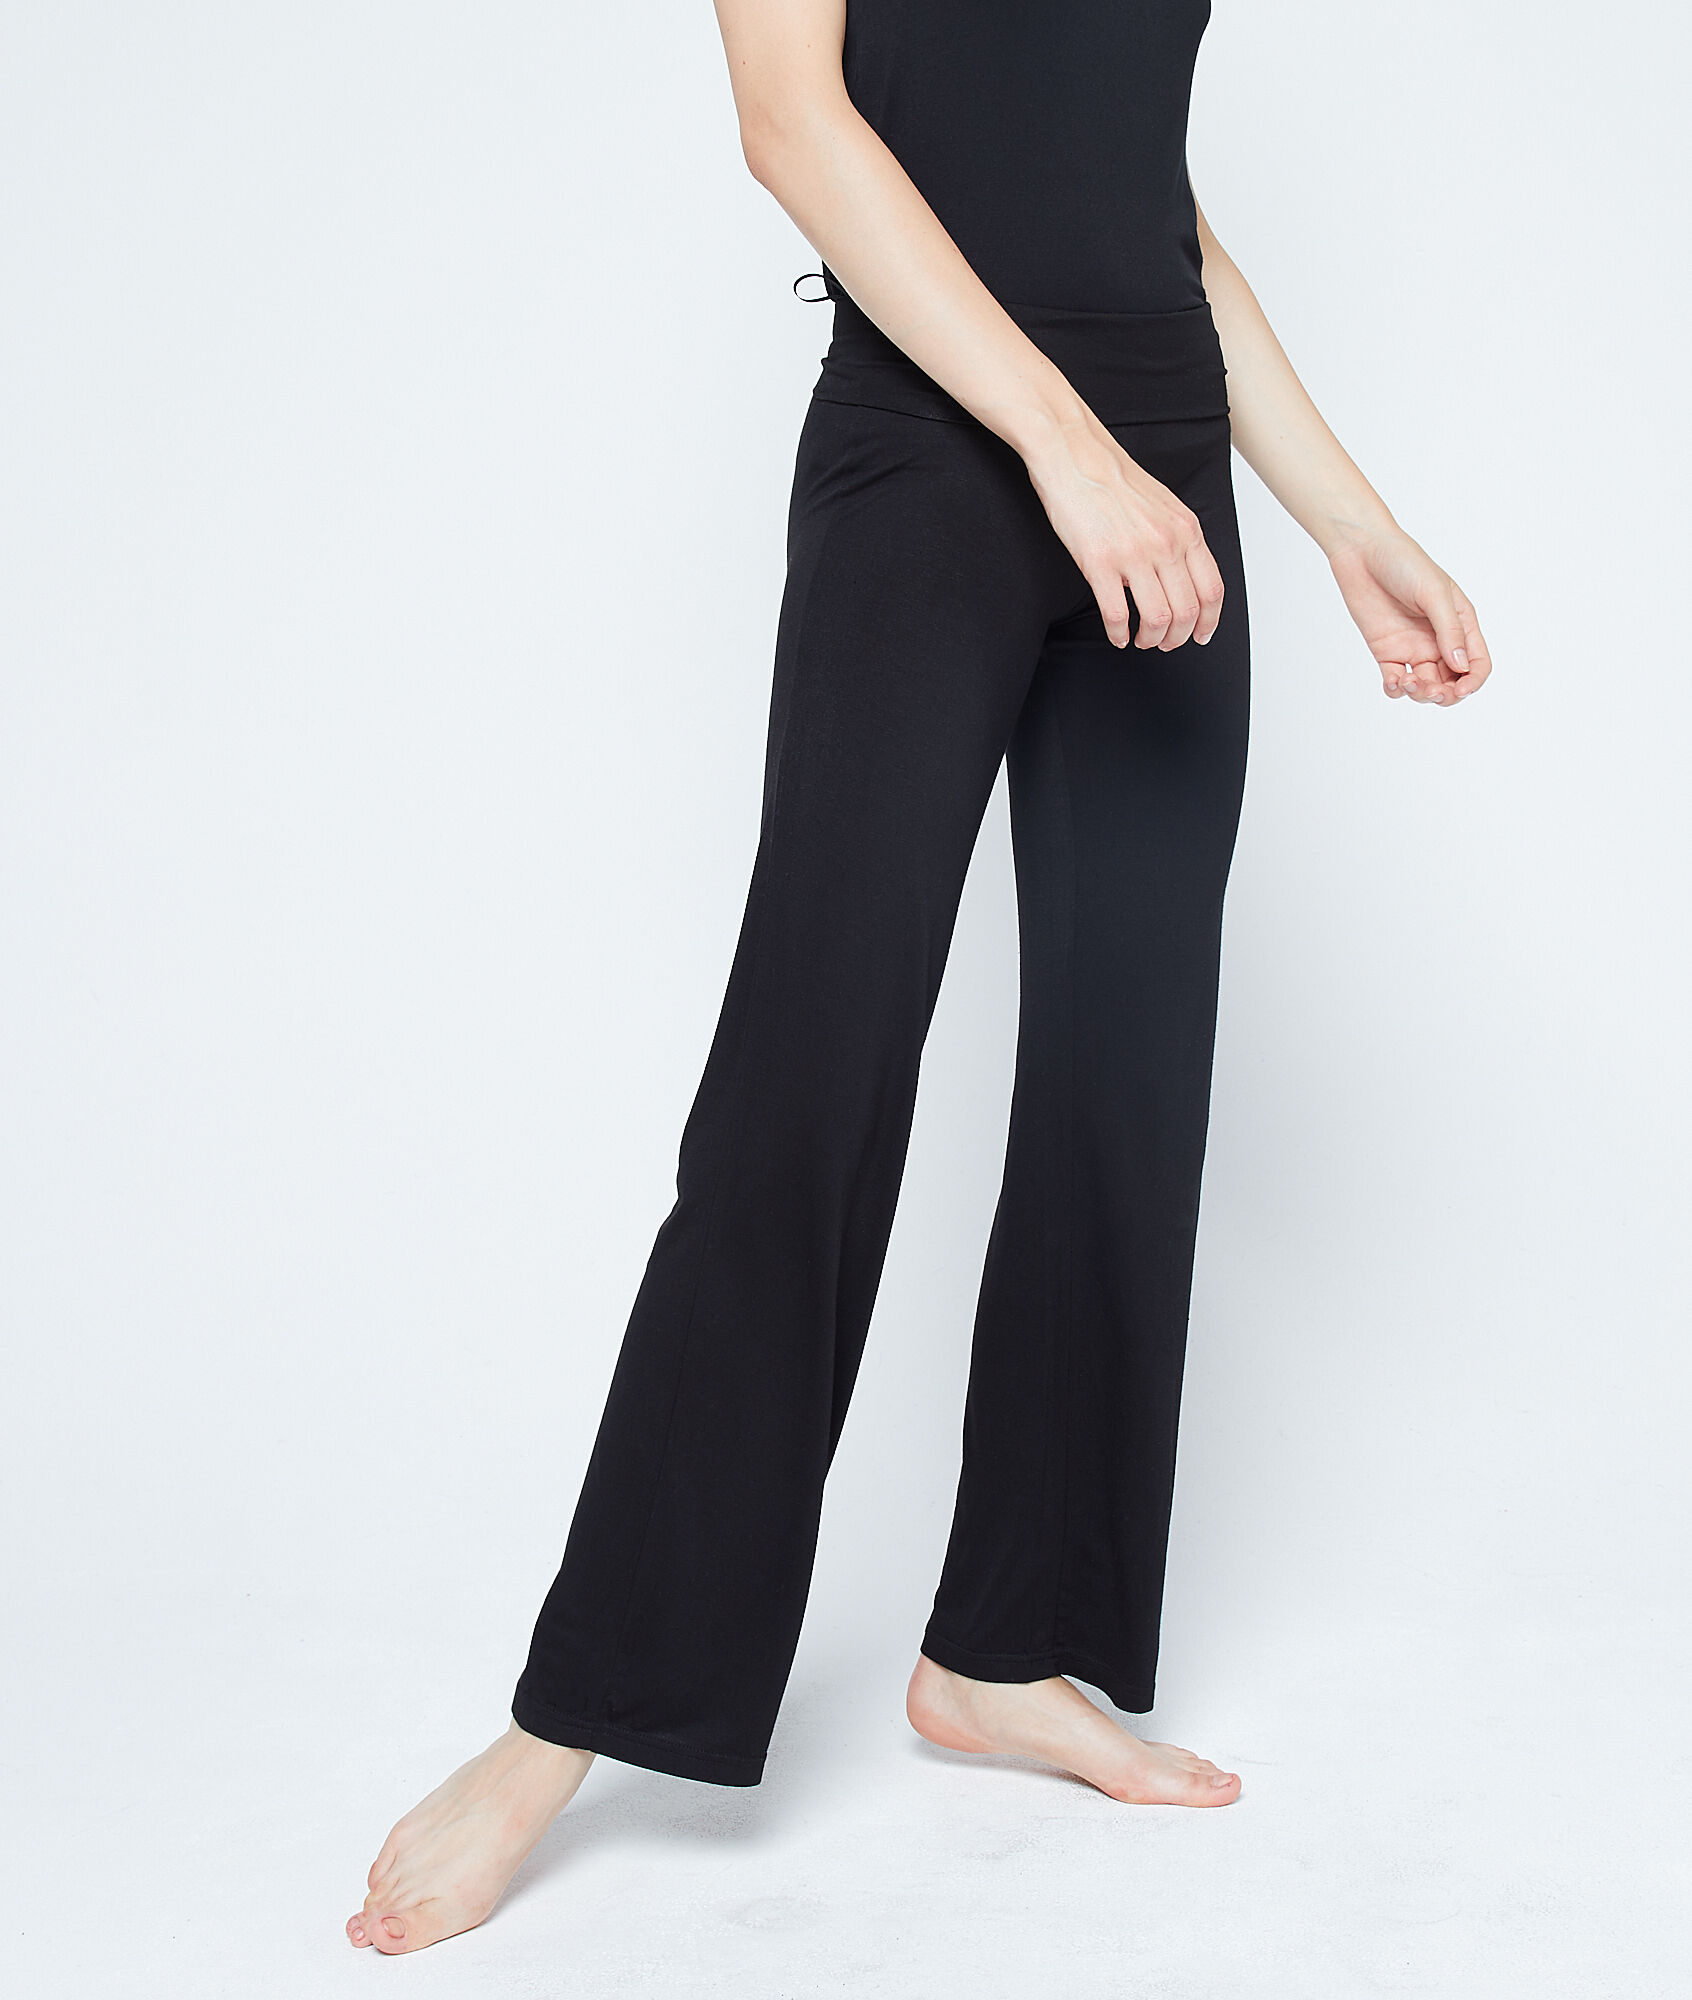 Pantalon fluide taille haute - AMELIA - NOIR - Etam b285e58409e